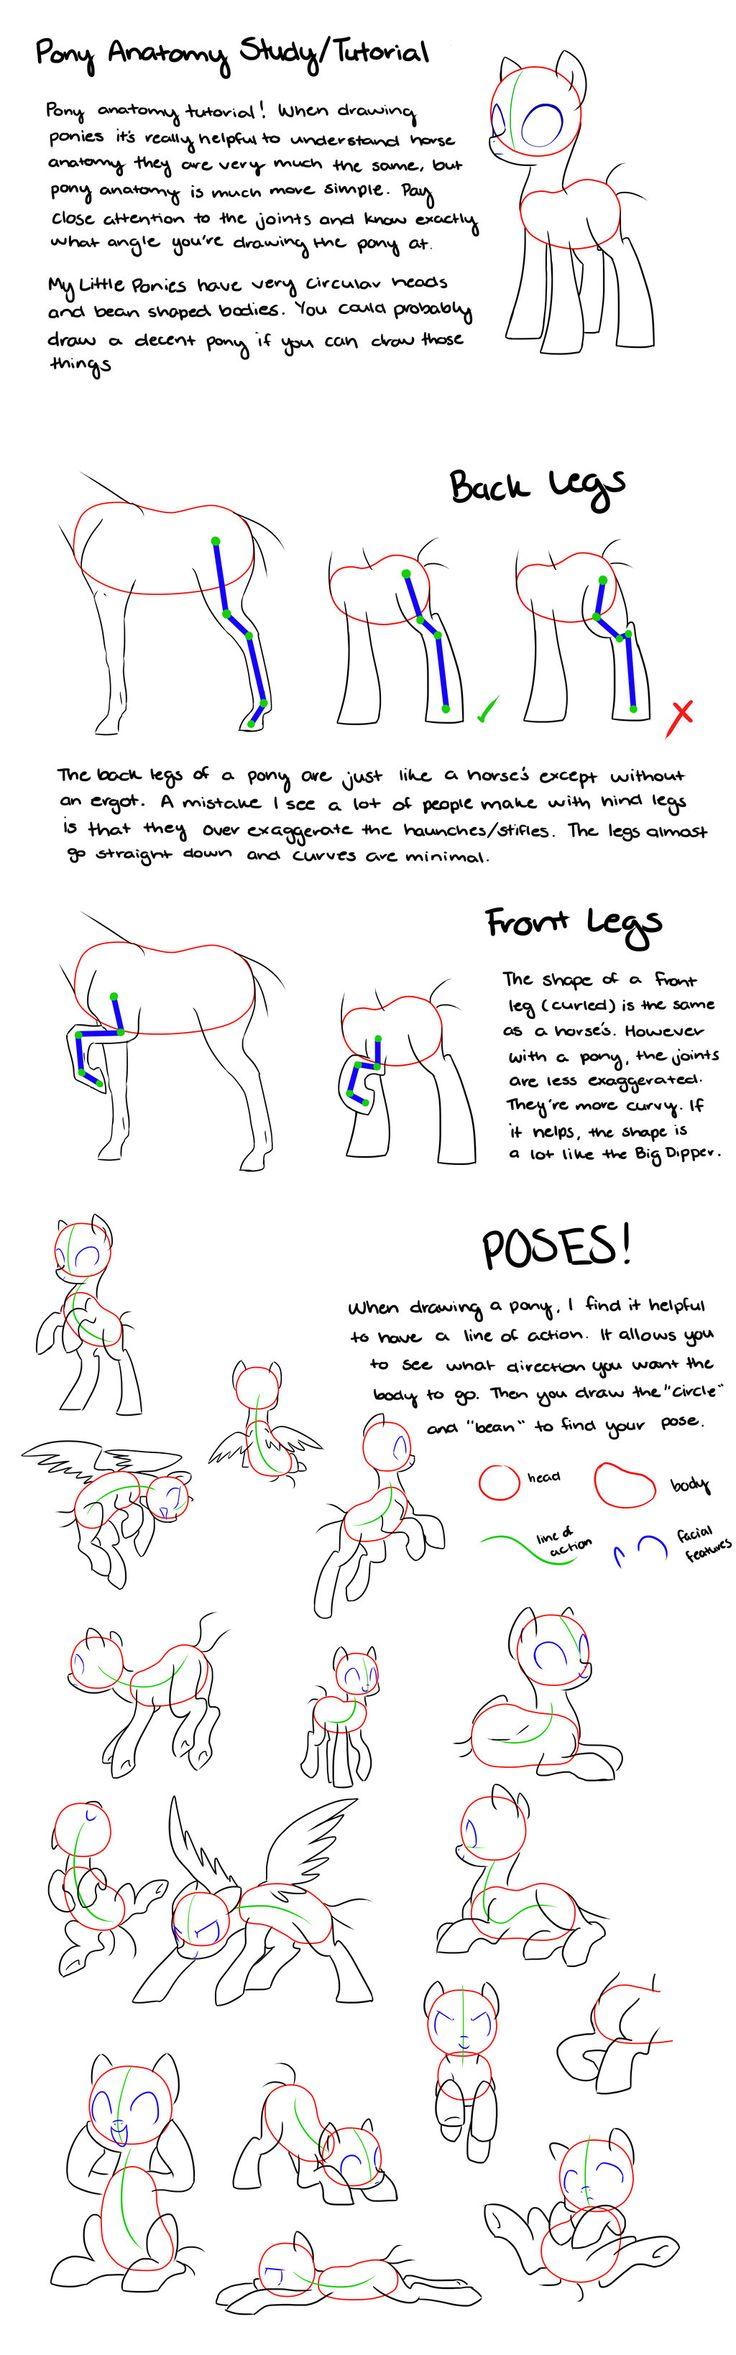 Pony Anatomy Tips/Study/Tutorial by kilala97 on DeviantArt